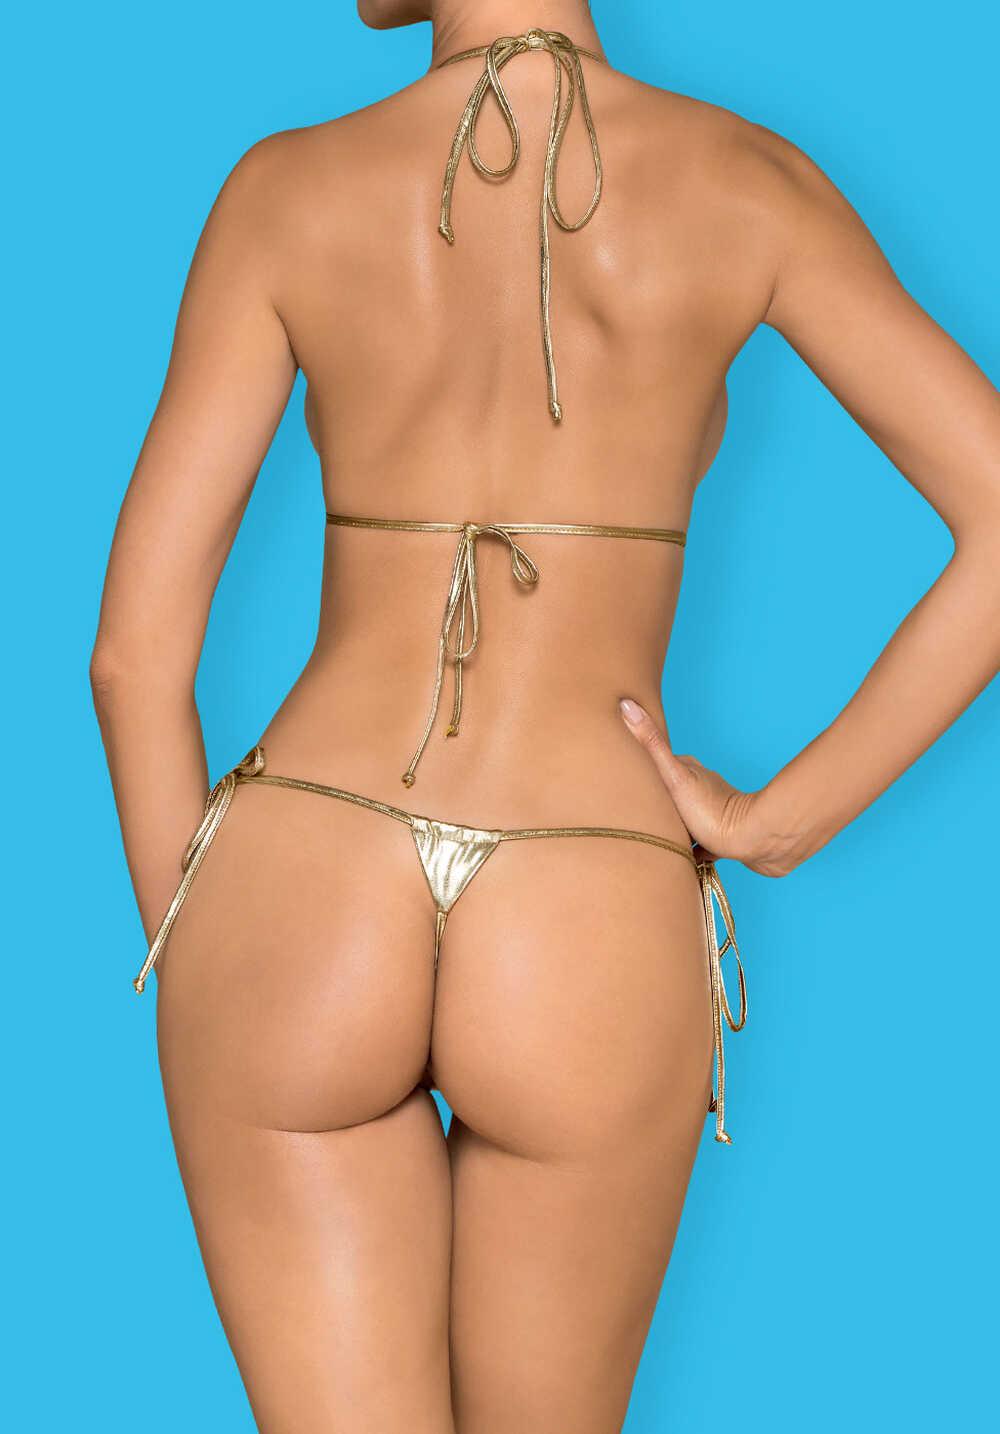 Afbeelding2 Artikel: Micro Bikini goud Variant: 1132 Parent:  Datum: 05/06/2020 19:11:23